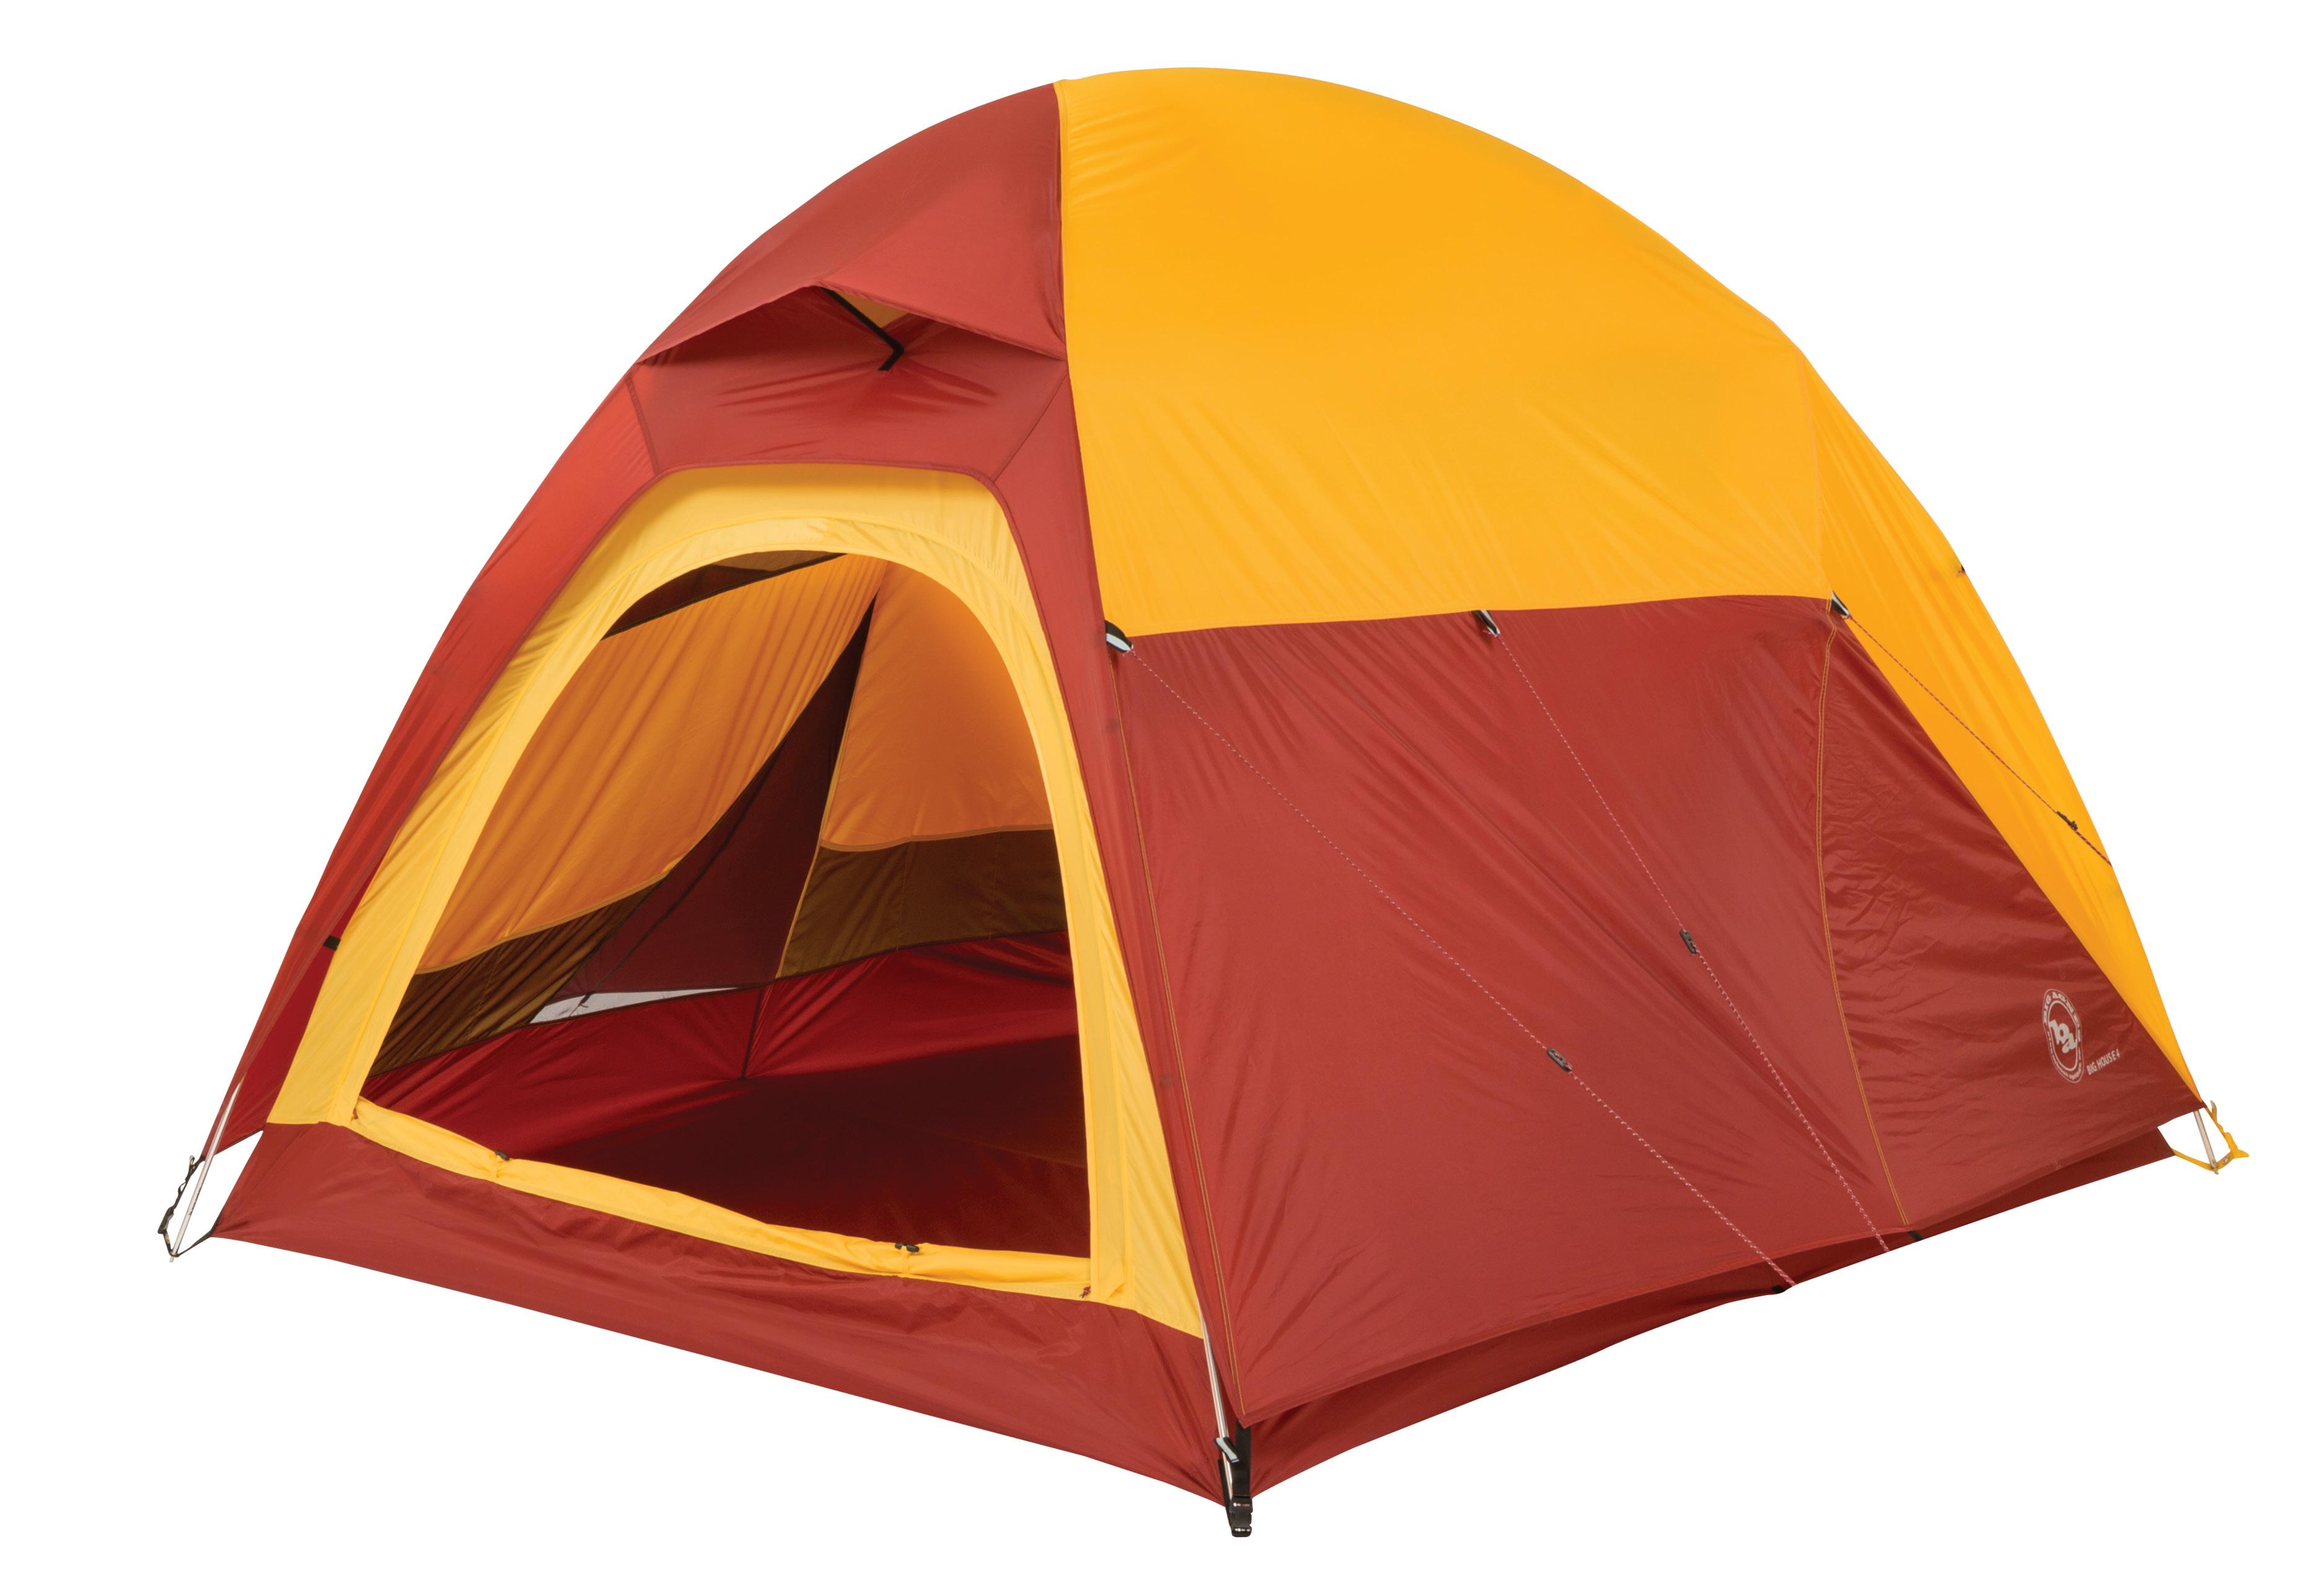 Big agnes big house 6 person tent 873840002653 ebay Tent a house